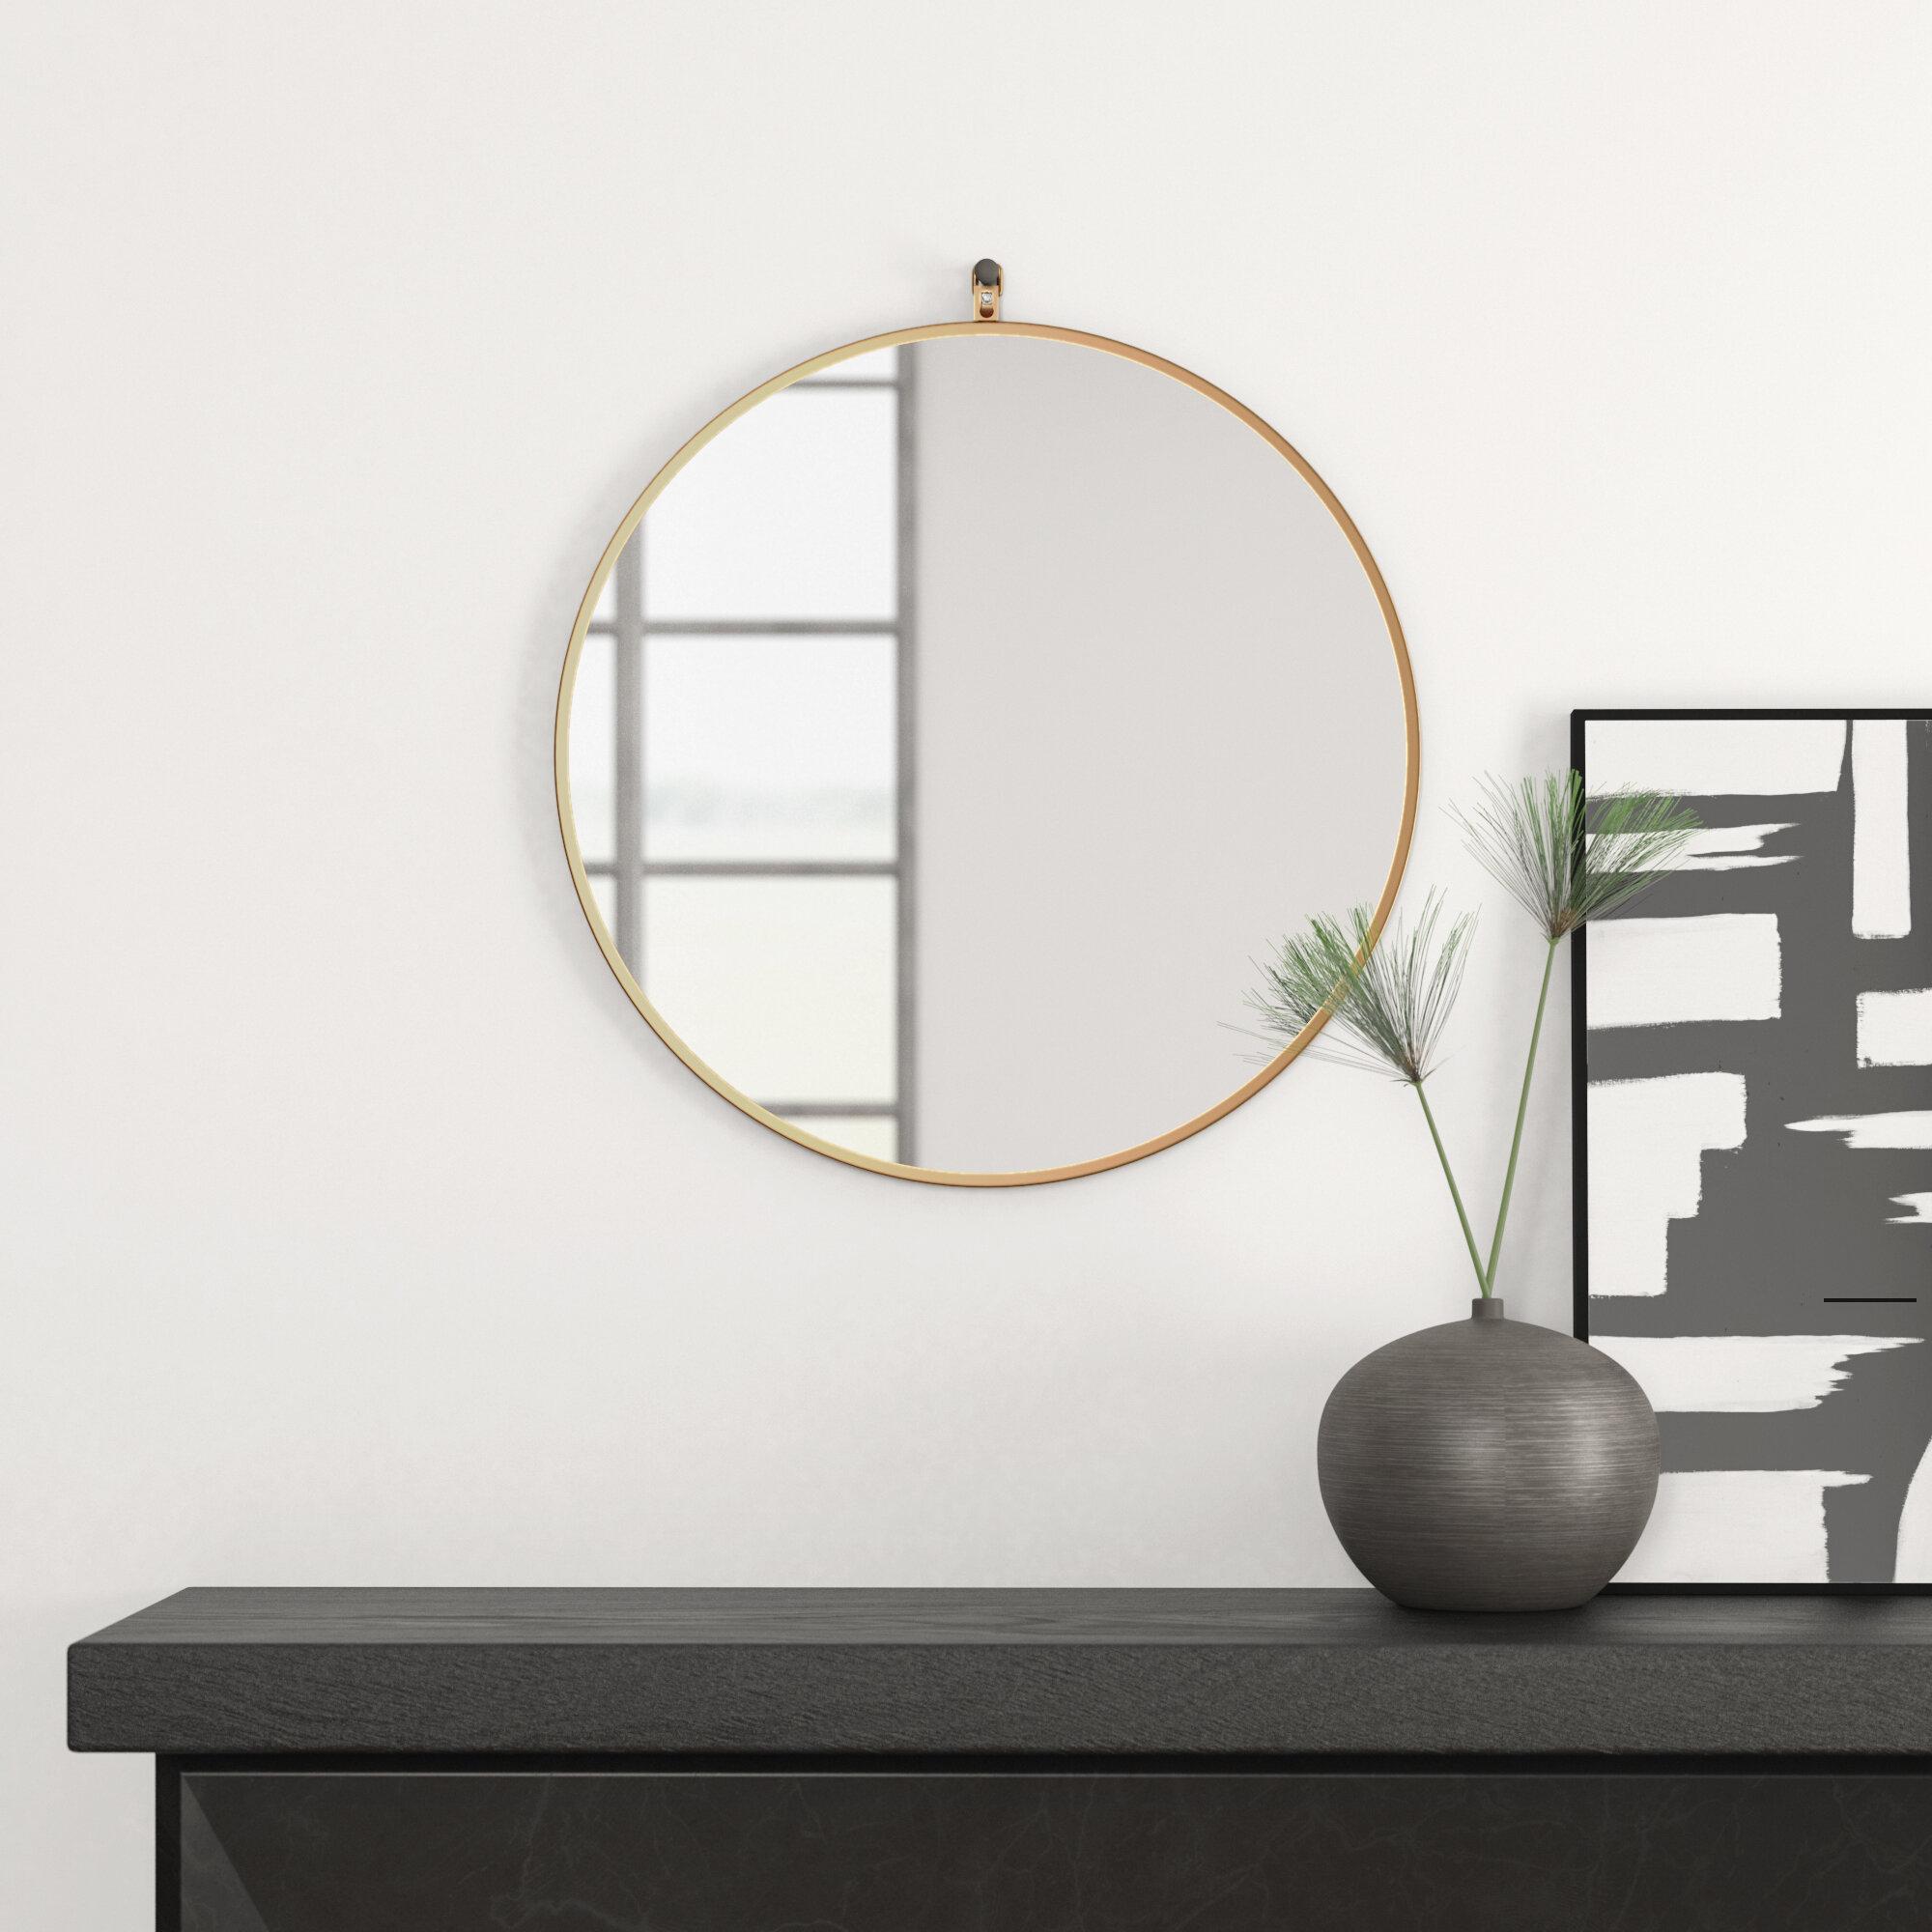 Modern & Contemporary Framed Bathroom Mirrors | Allmodern Pertaining To Landover Rustic Distressed Bathroom/vanity Mirrors (Image 14 of 20)